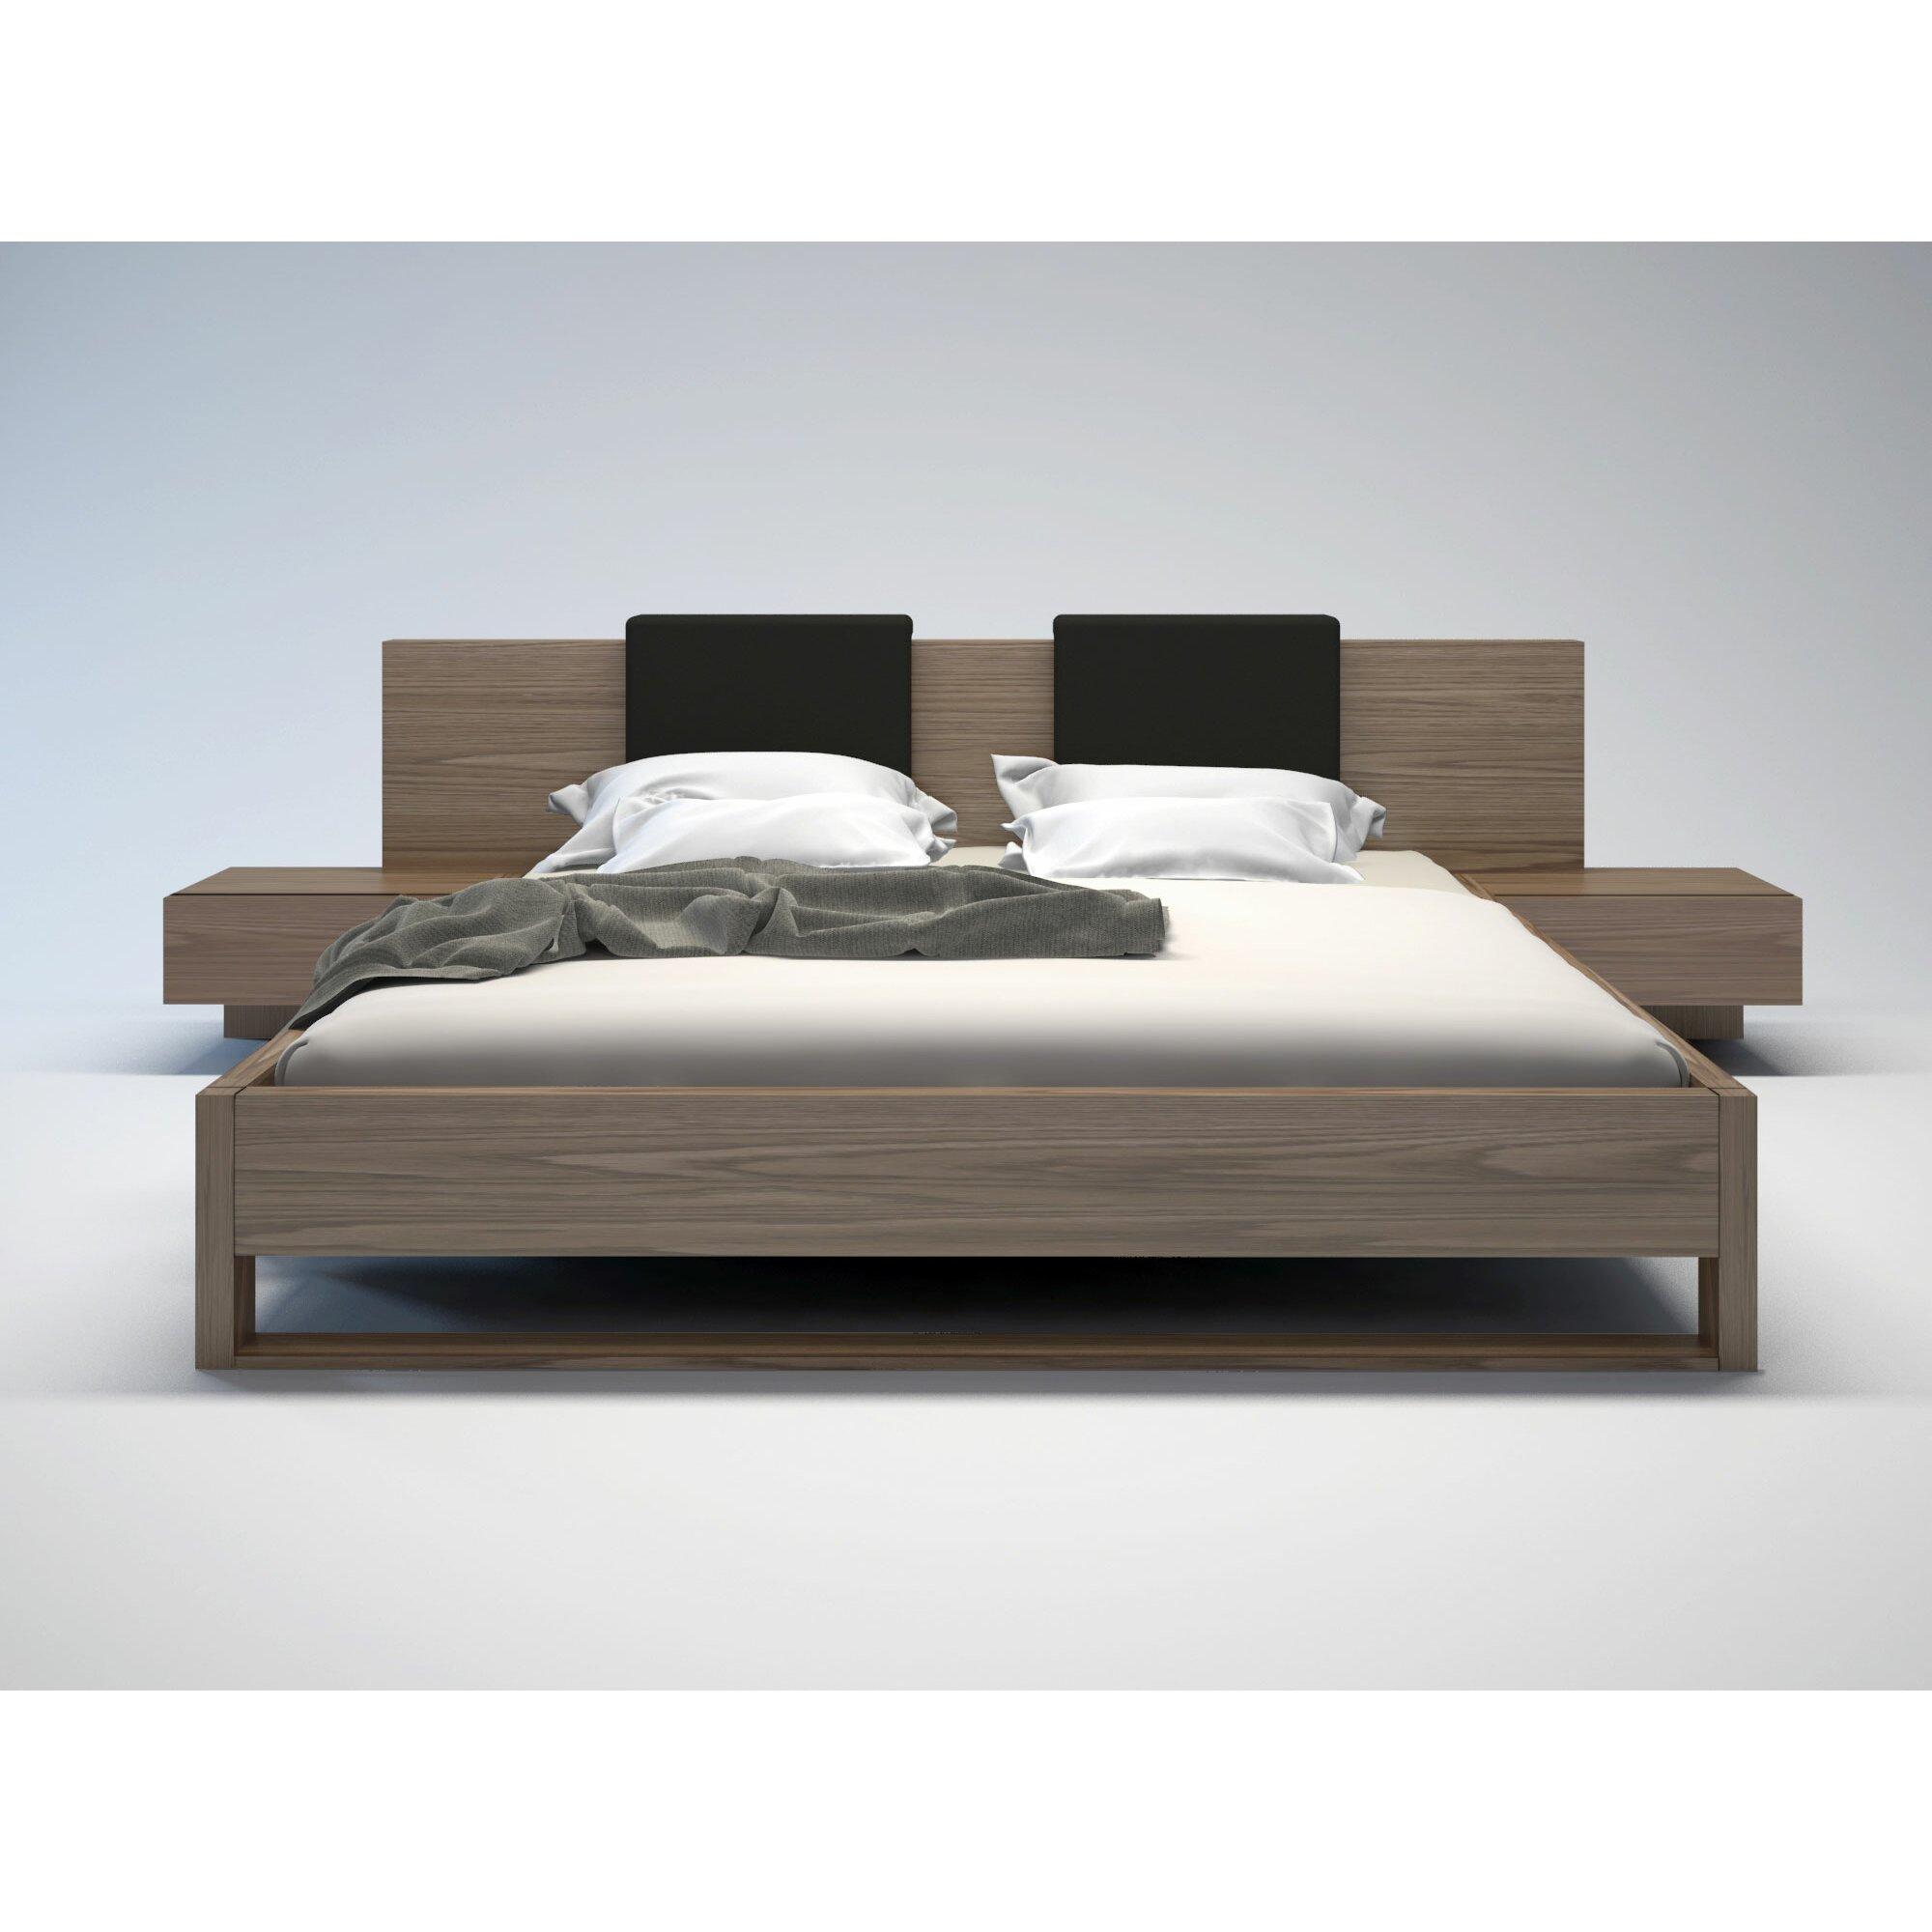 Modloft Monroe Upholstered Platform Bed Reviews Wayfair